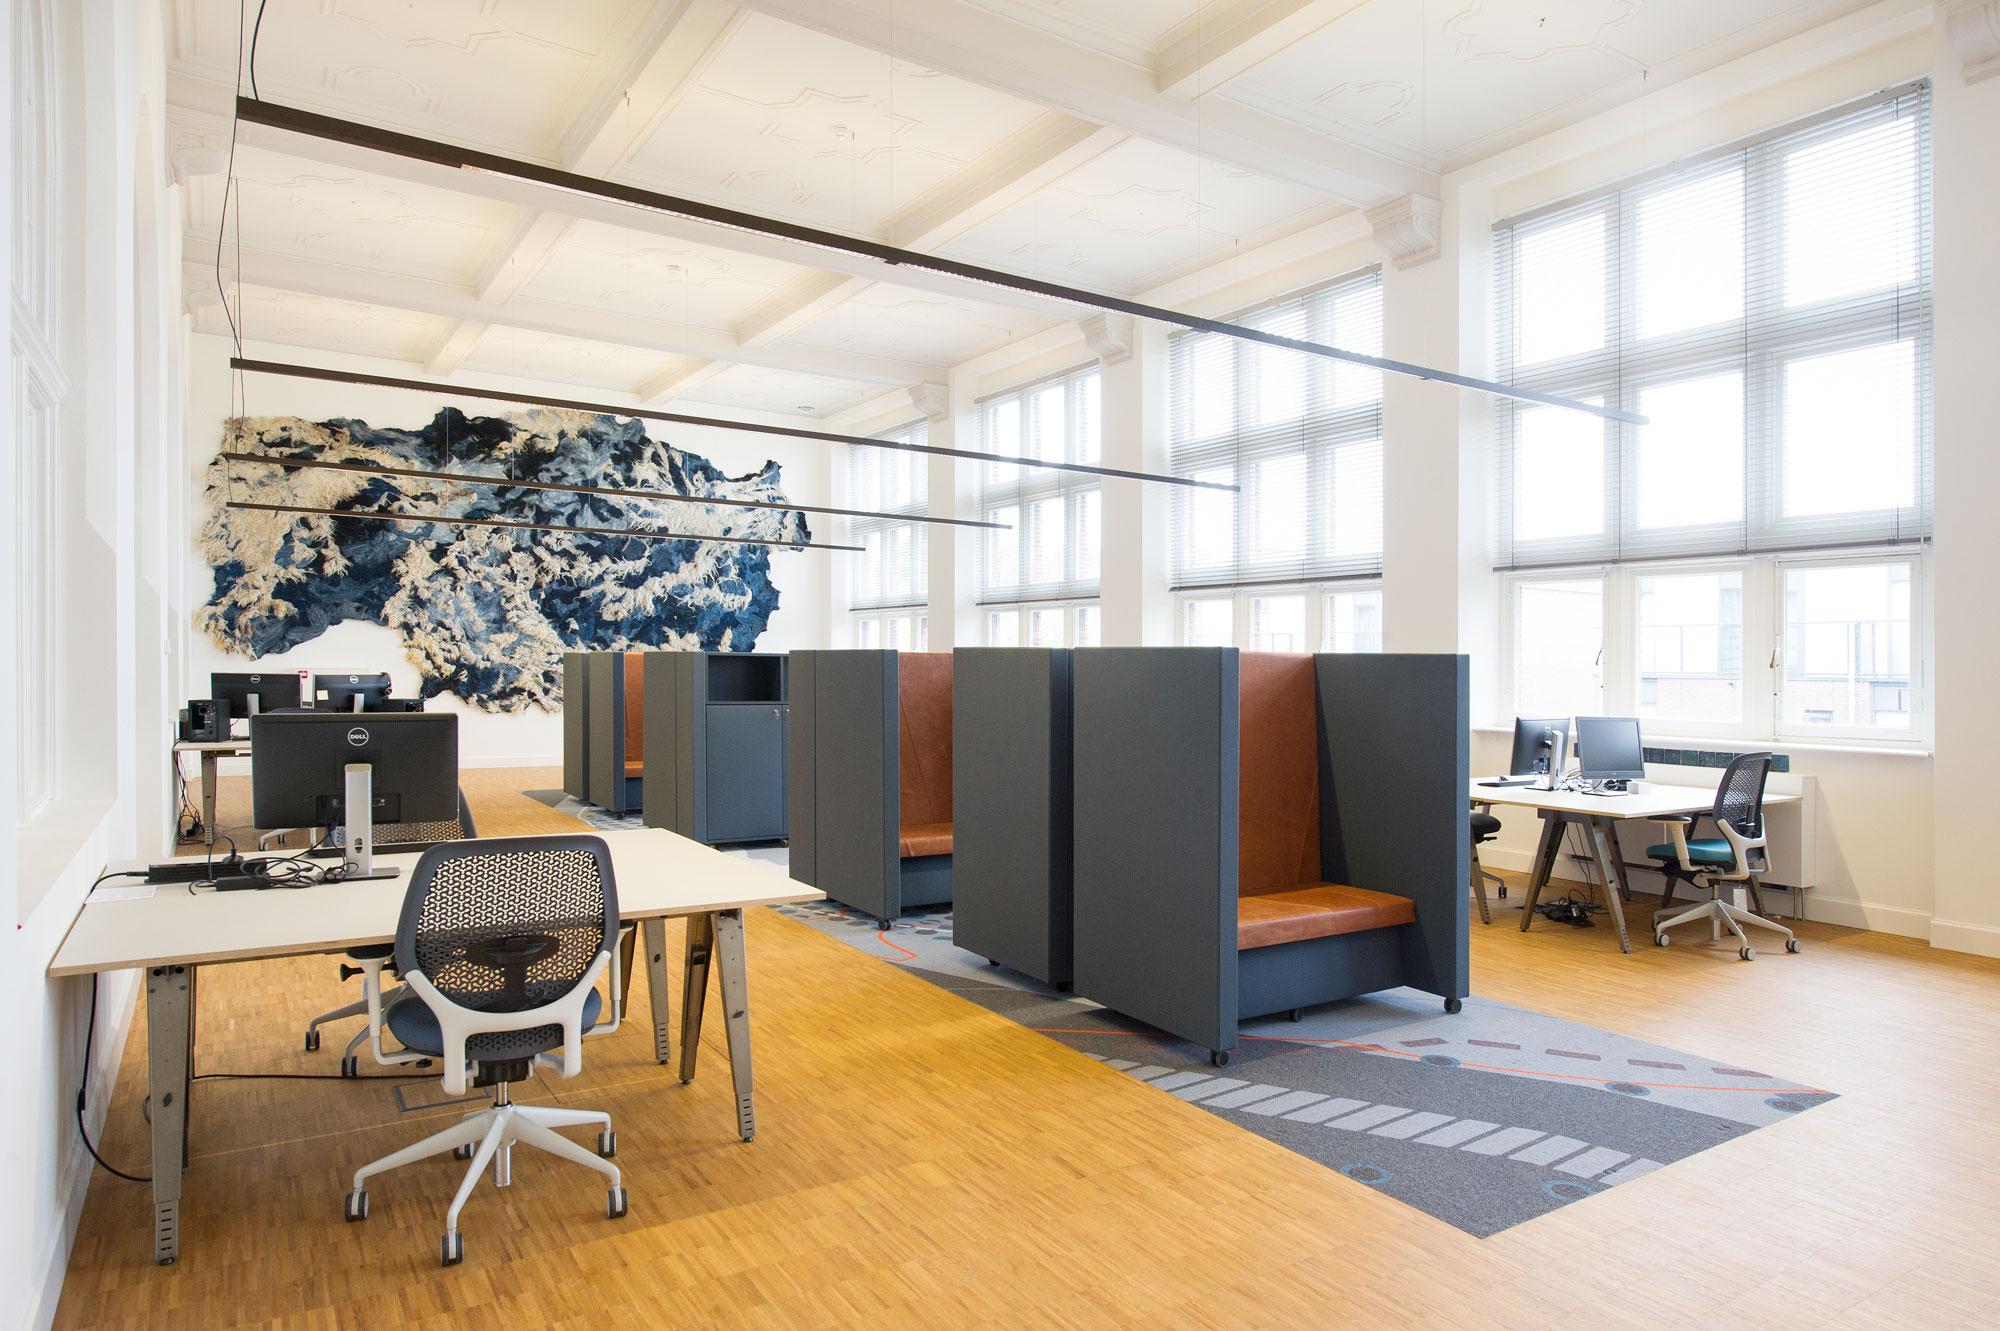 kantoren de oude bibliotheek, KREUK architectuur, architect Marjolein Kreuk Delft i.s.m. BK. en Stephanie Gieles